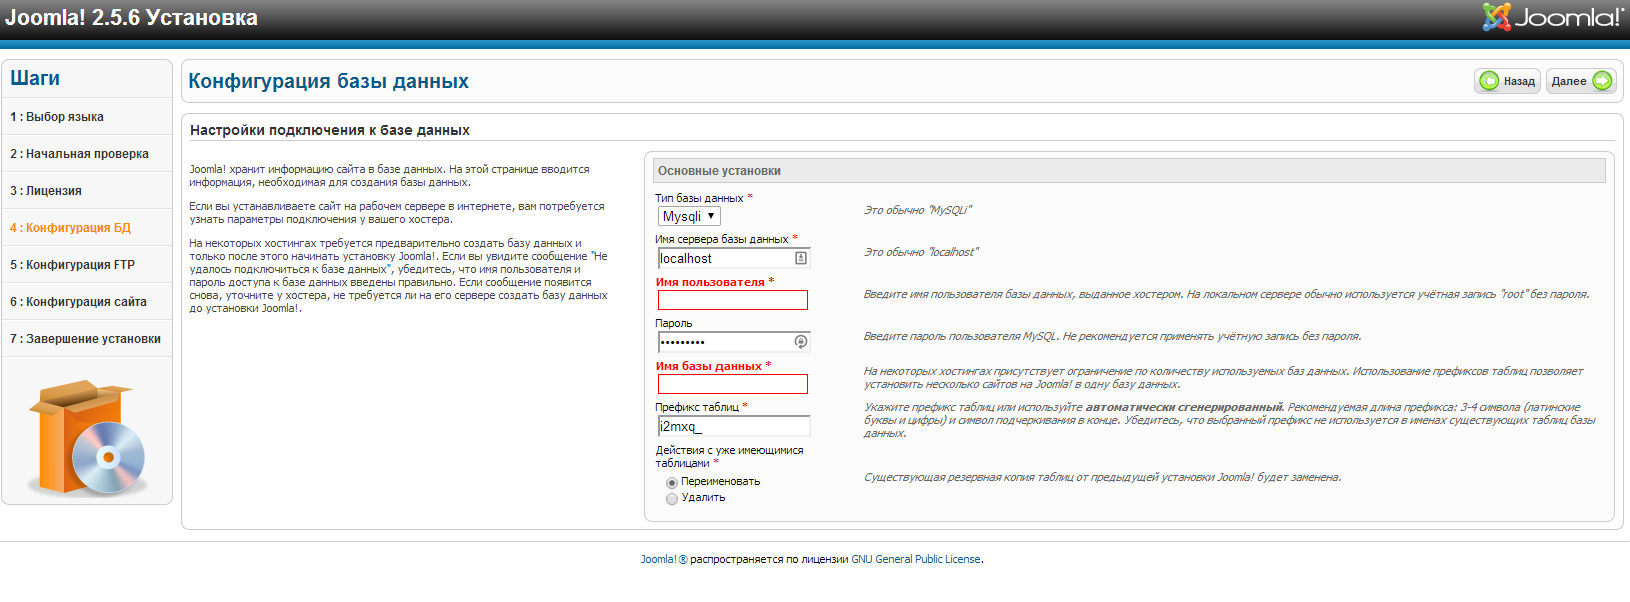 Конфигурация базы данных - Joomla